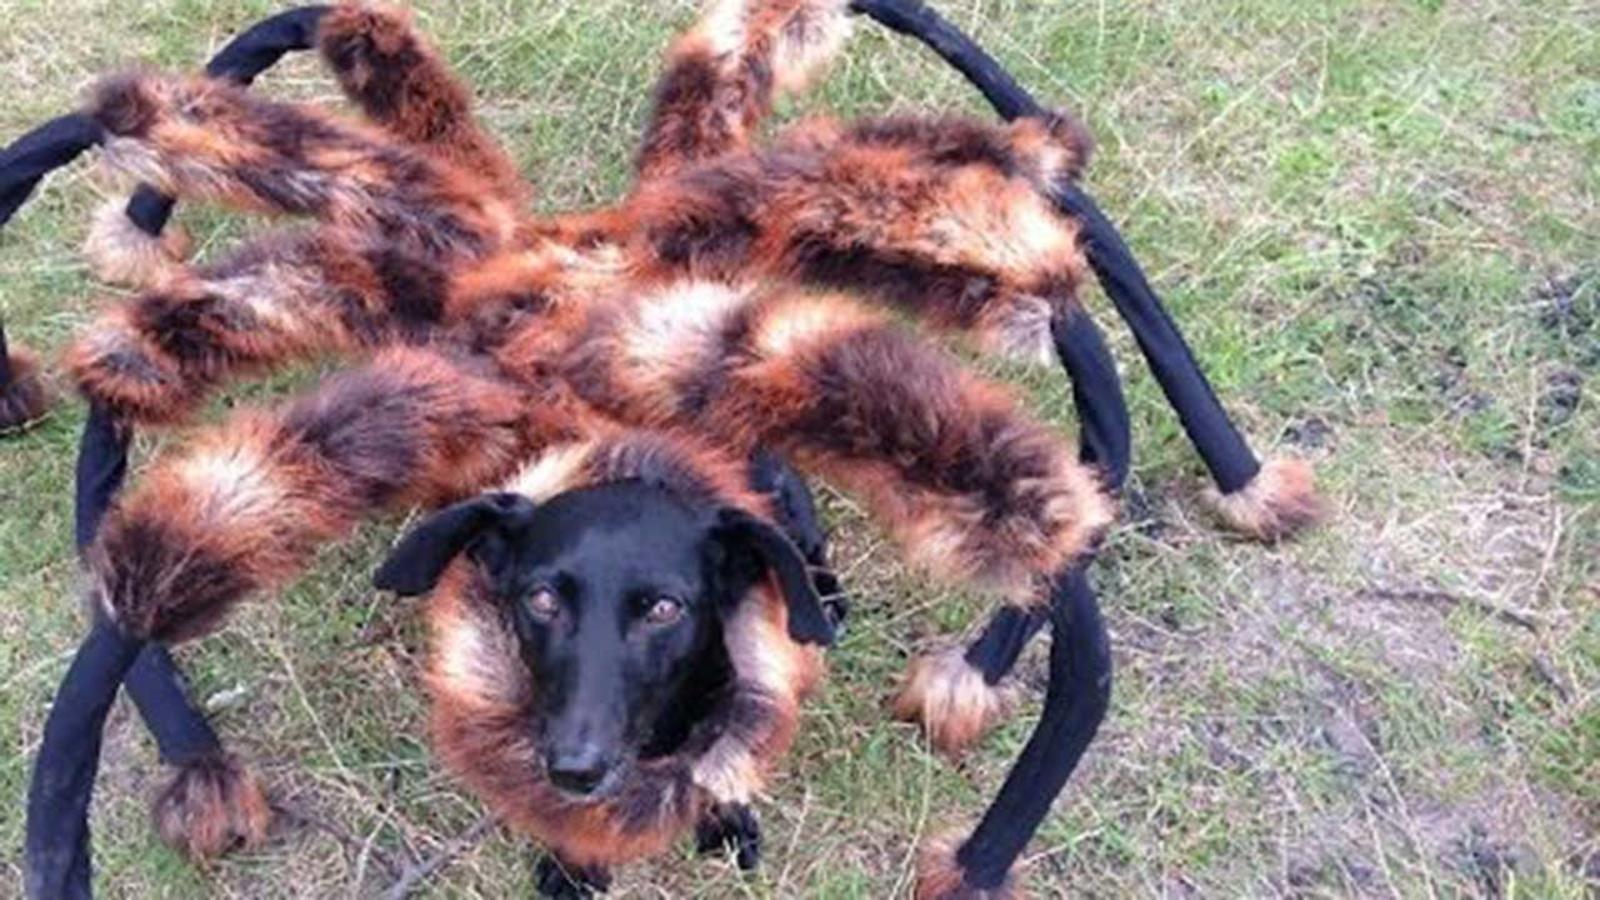 Spider Dog Hilarious Internet Sensation Or Mean Prank Abc7 San